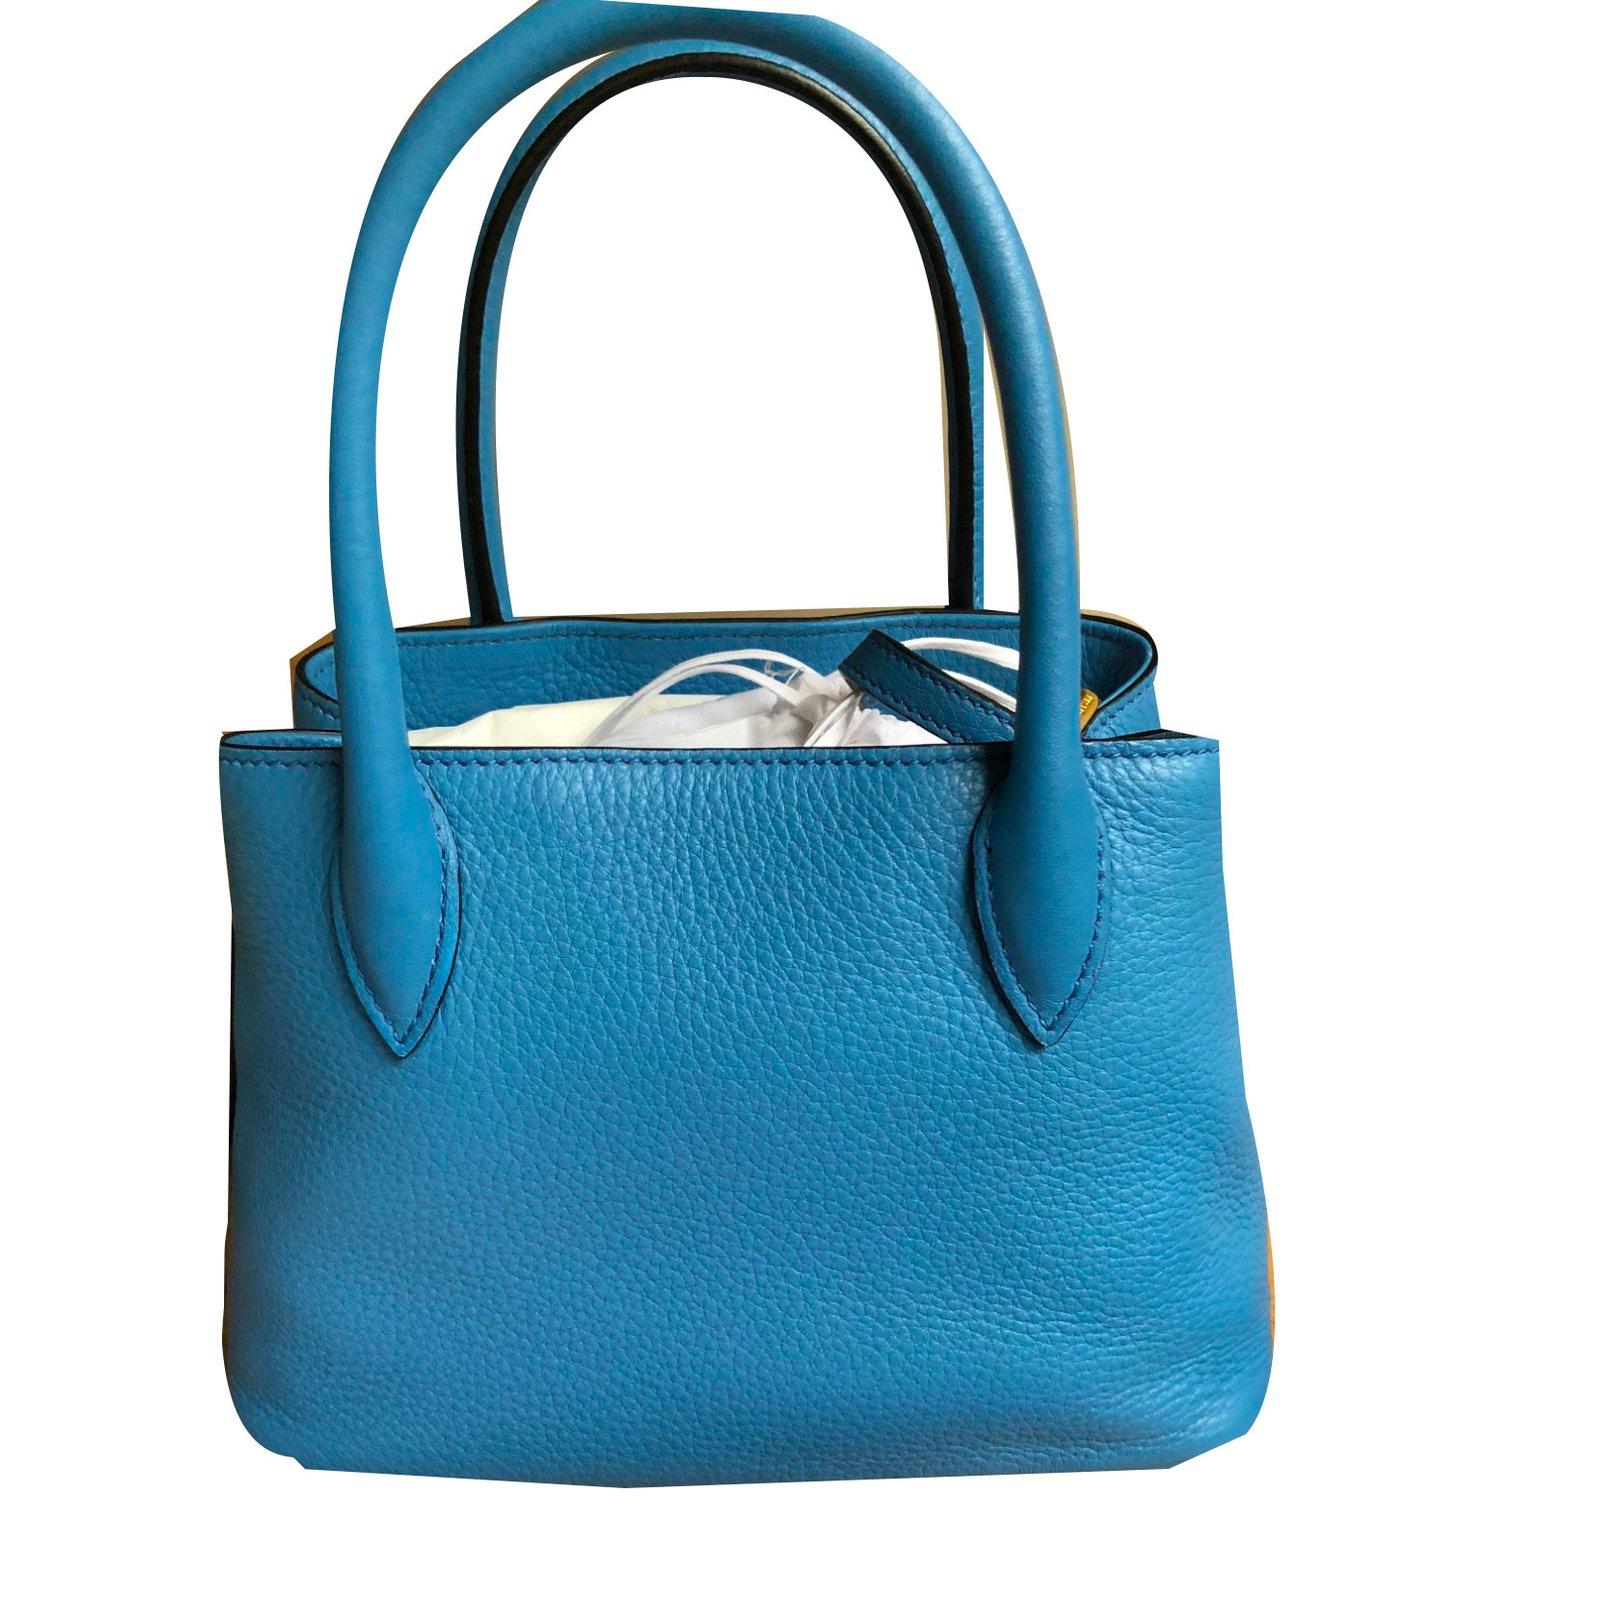 8d84e219f85 Prada mini cross body bag in blue leather Handbags Leather Blue ref.78599 -  Joli Closet